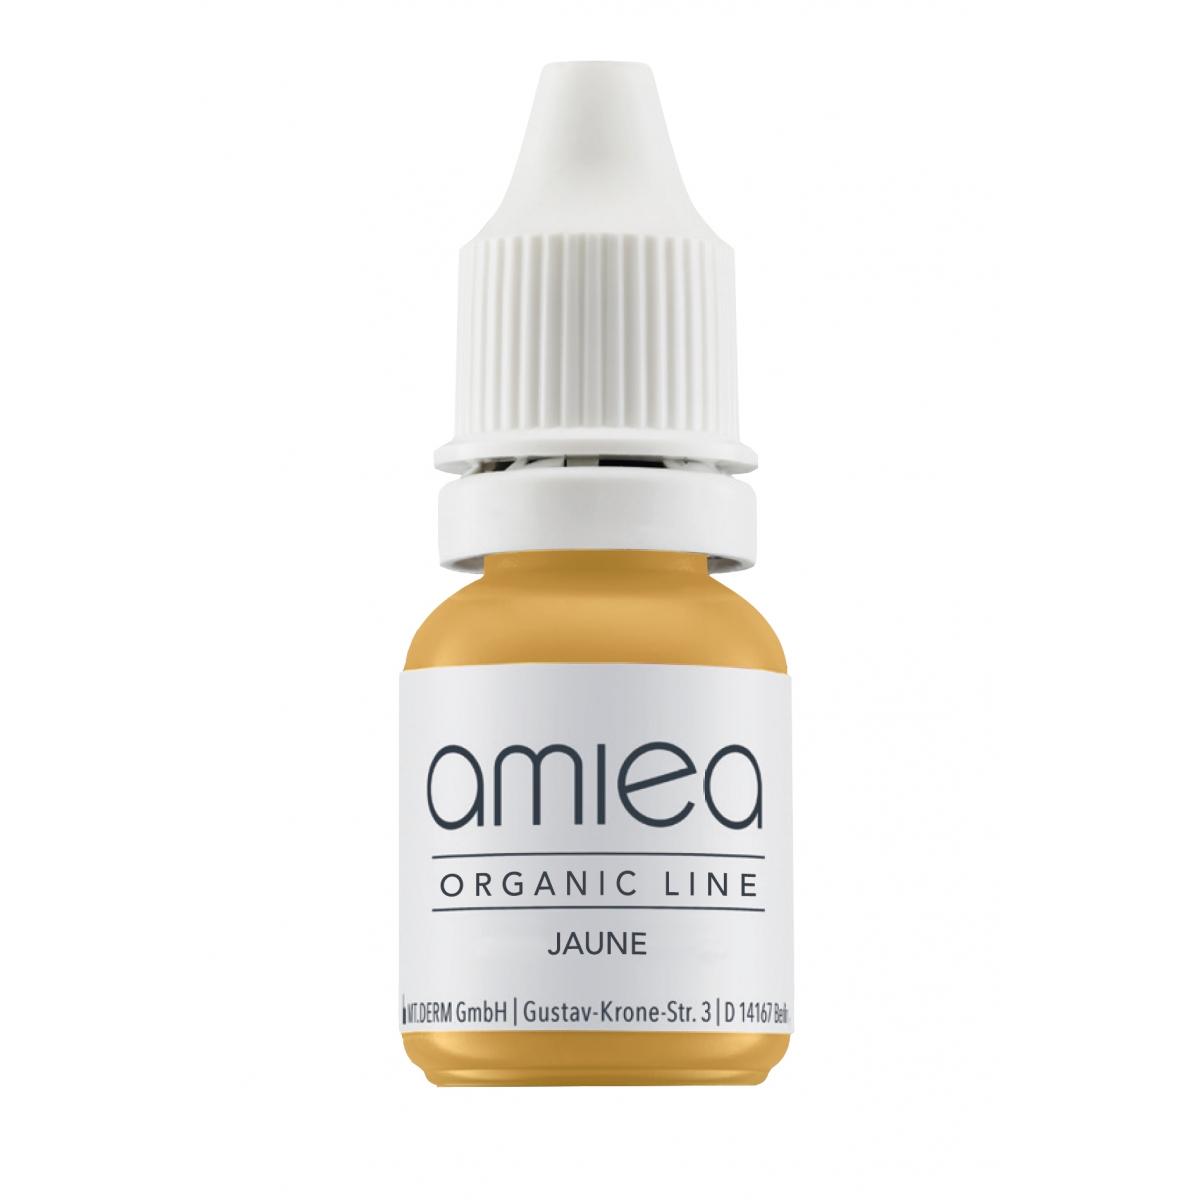 ORGANIC LINE (10ml) - PIGMENT CORRECTEUR JAUNE ORGANICLINE AMIEA (10 ml)